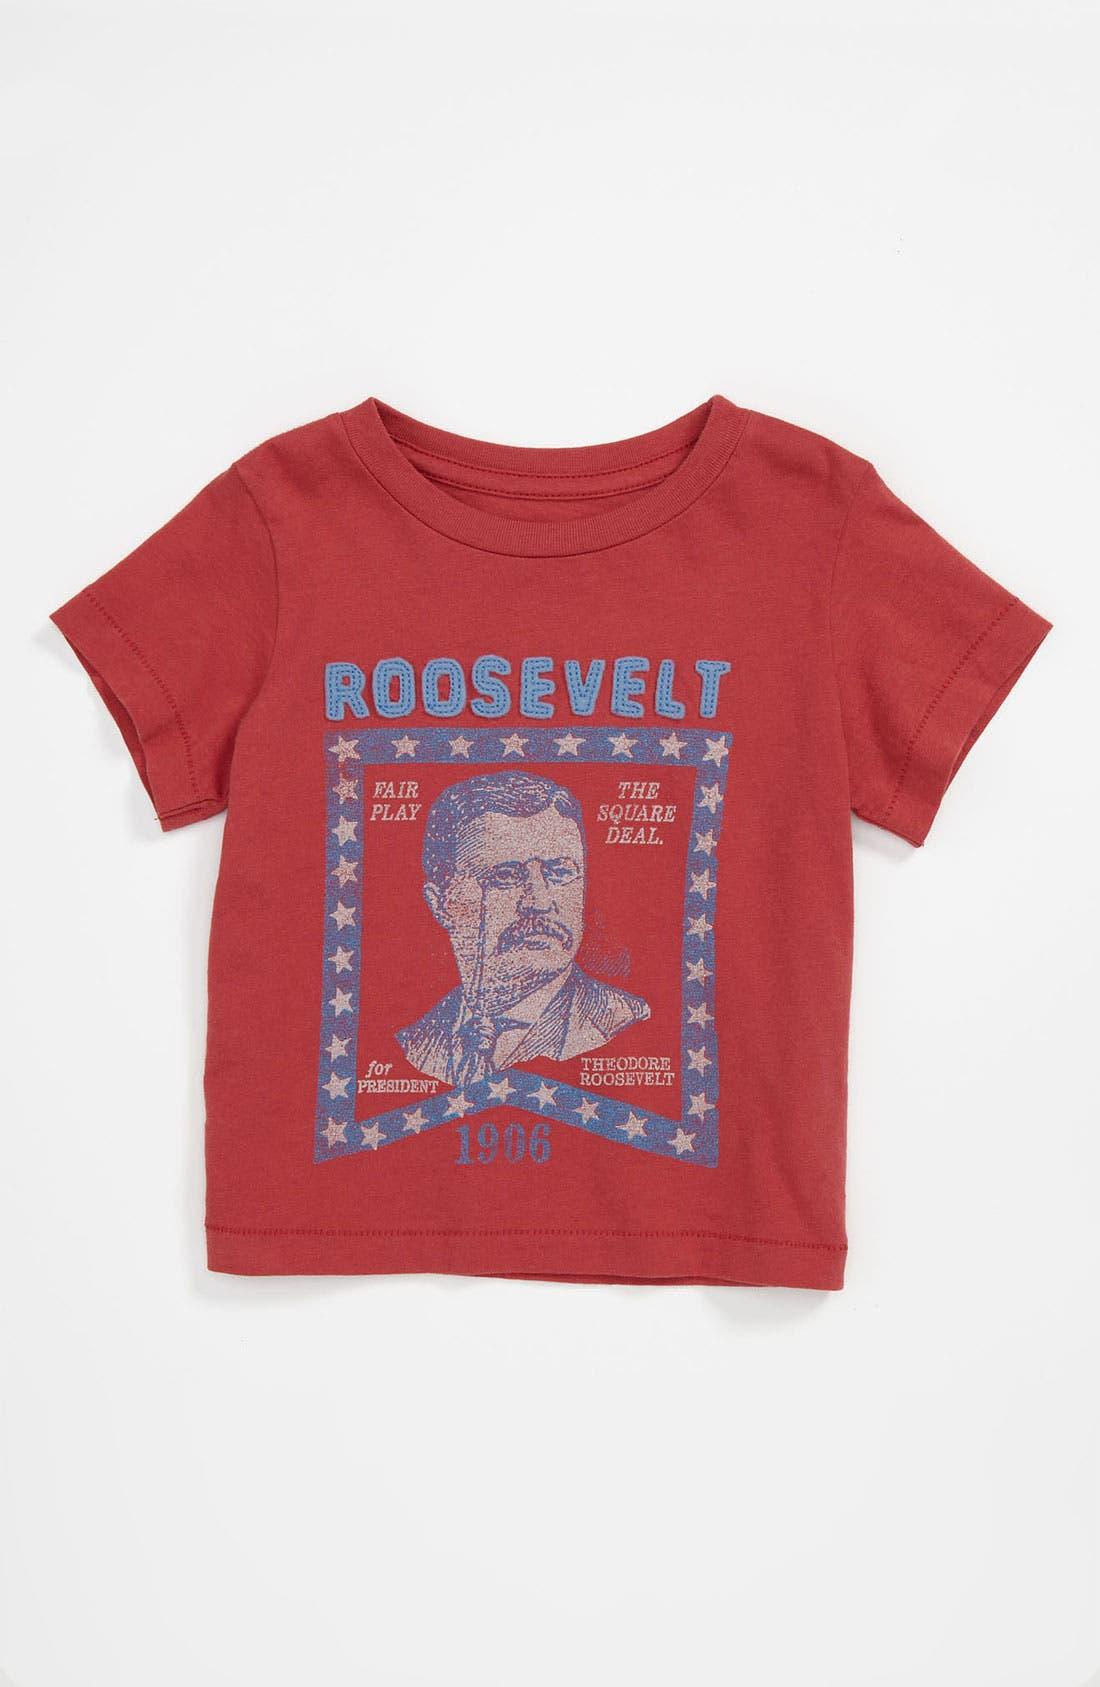 Alternate Image 1 Selected - Peek 'Roosevelt' T-Shirt (Infant)